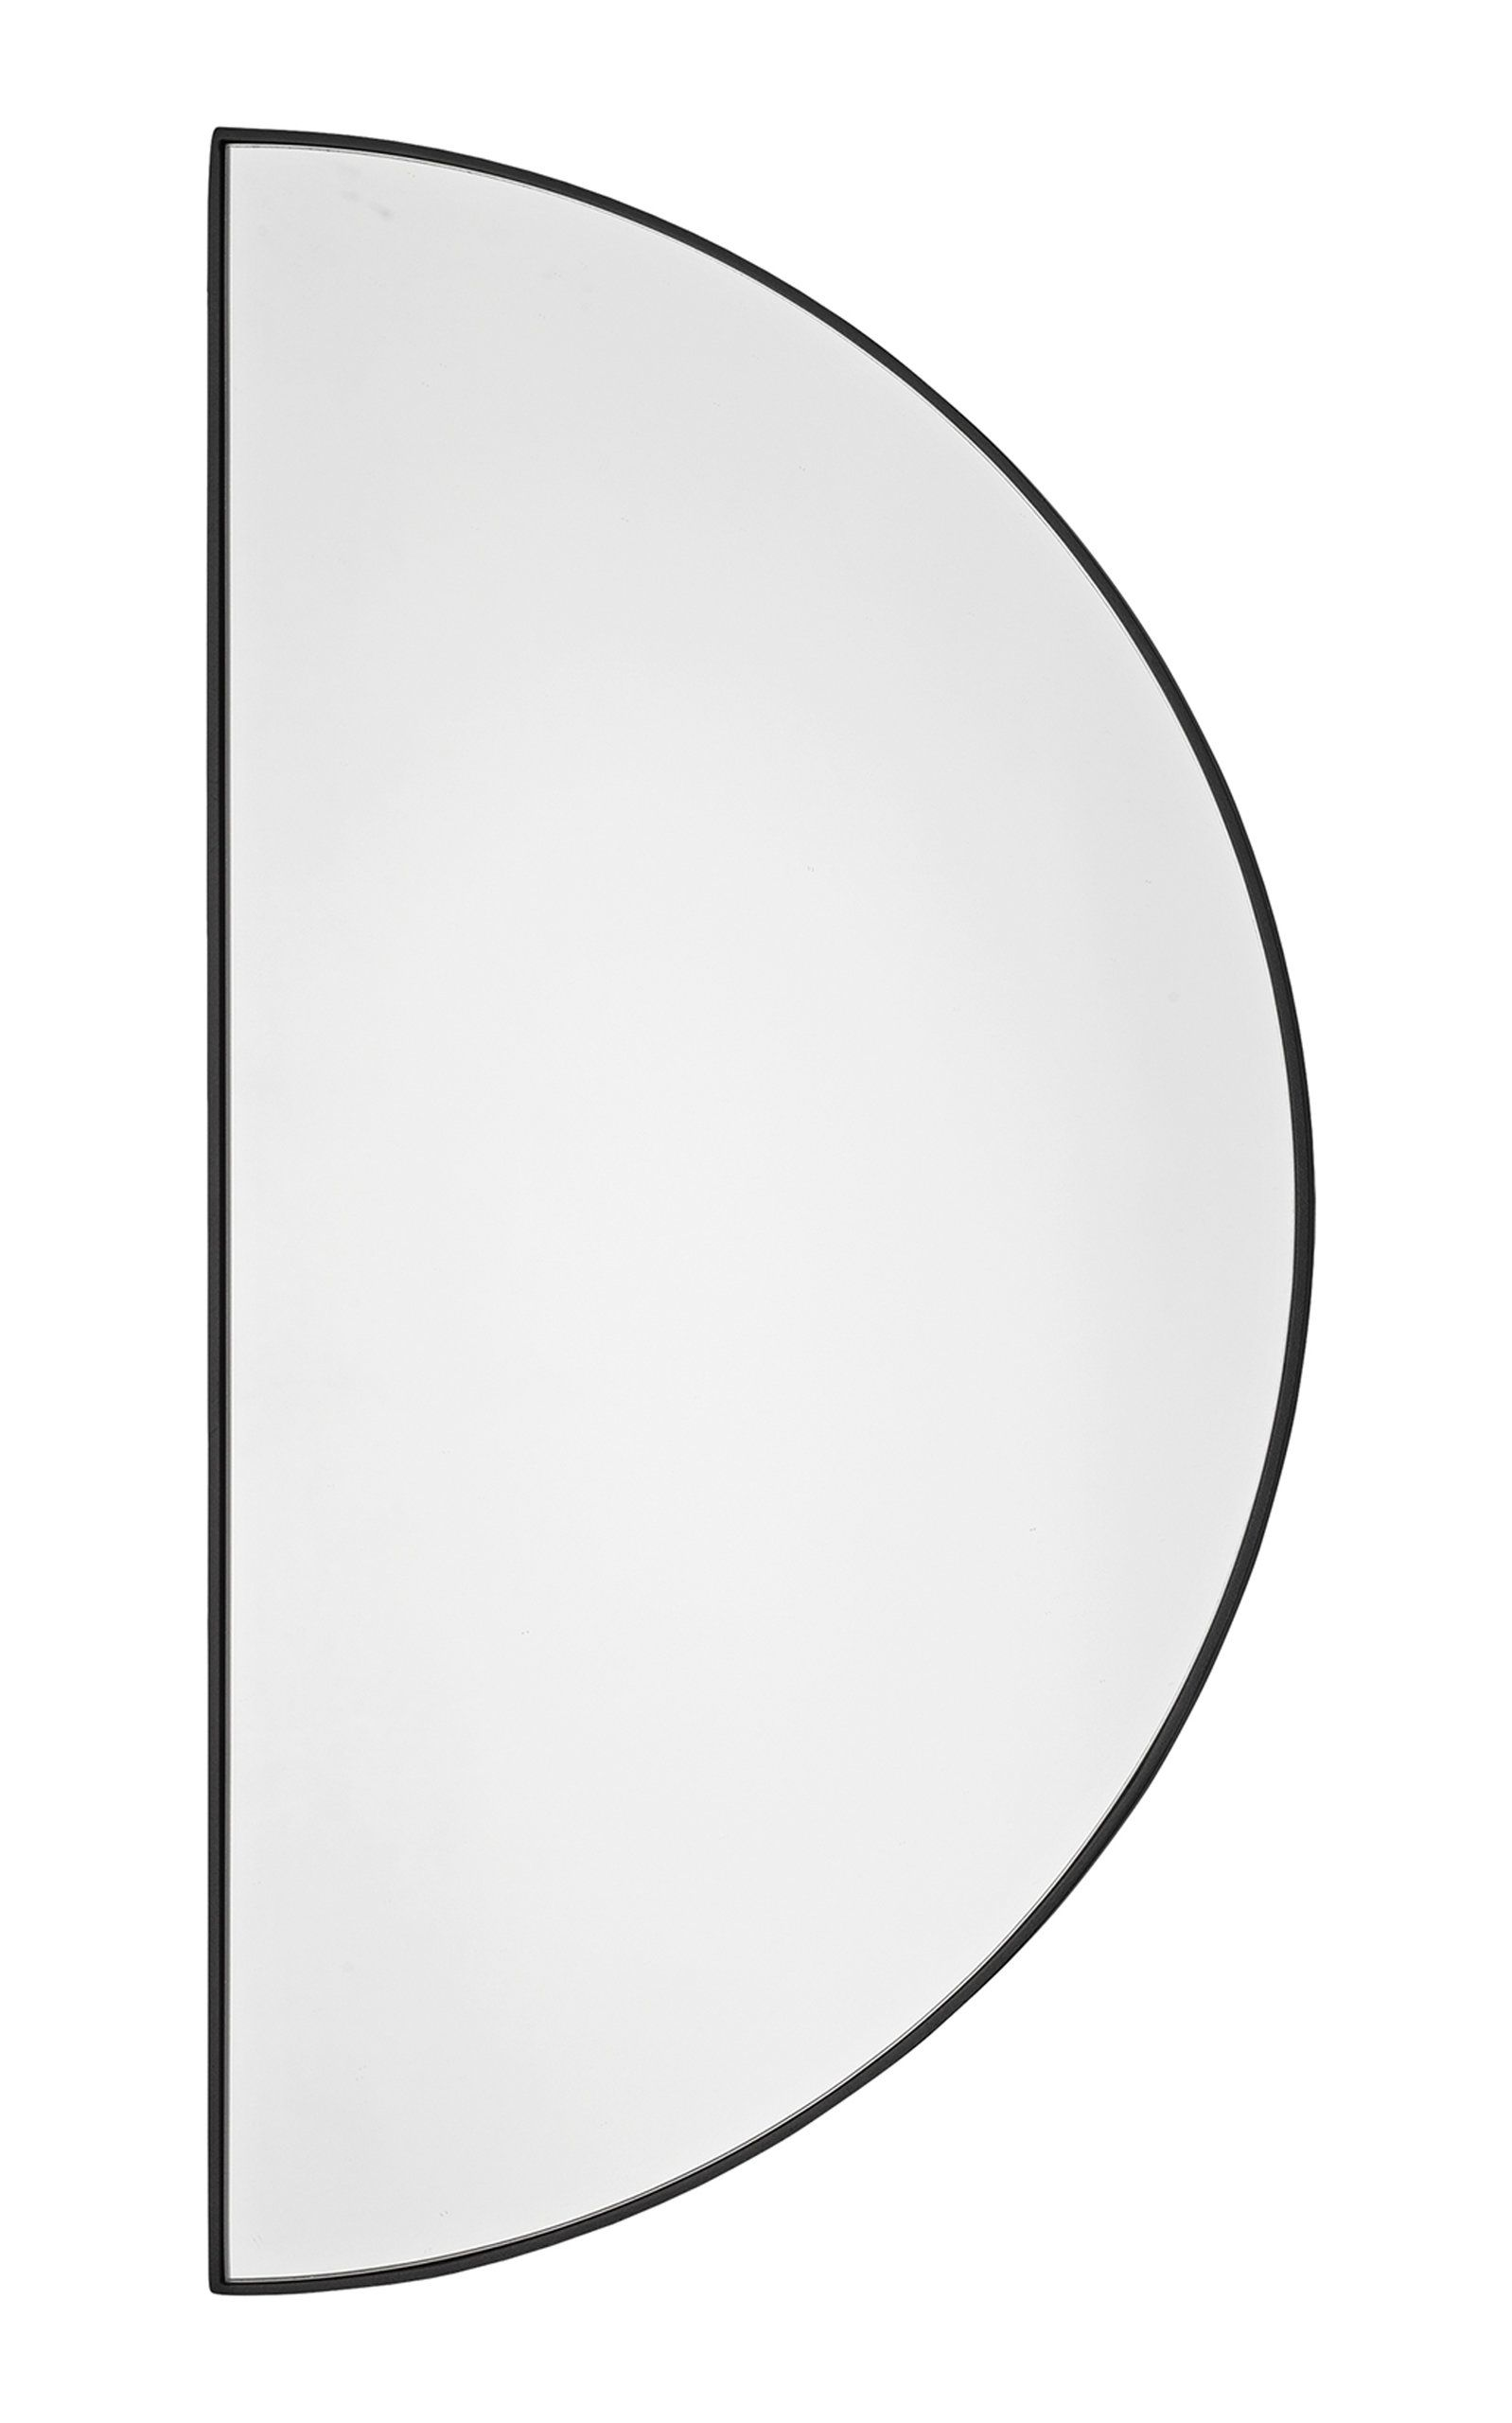 Aytm Unity Half Circle Mirror